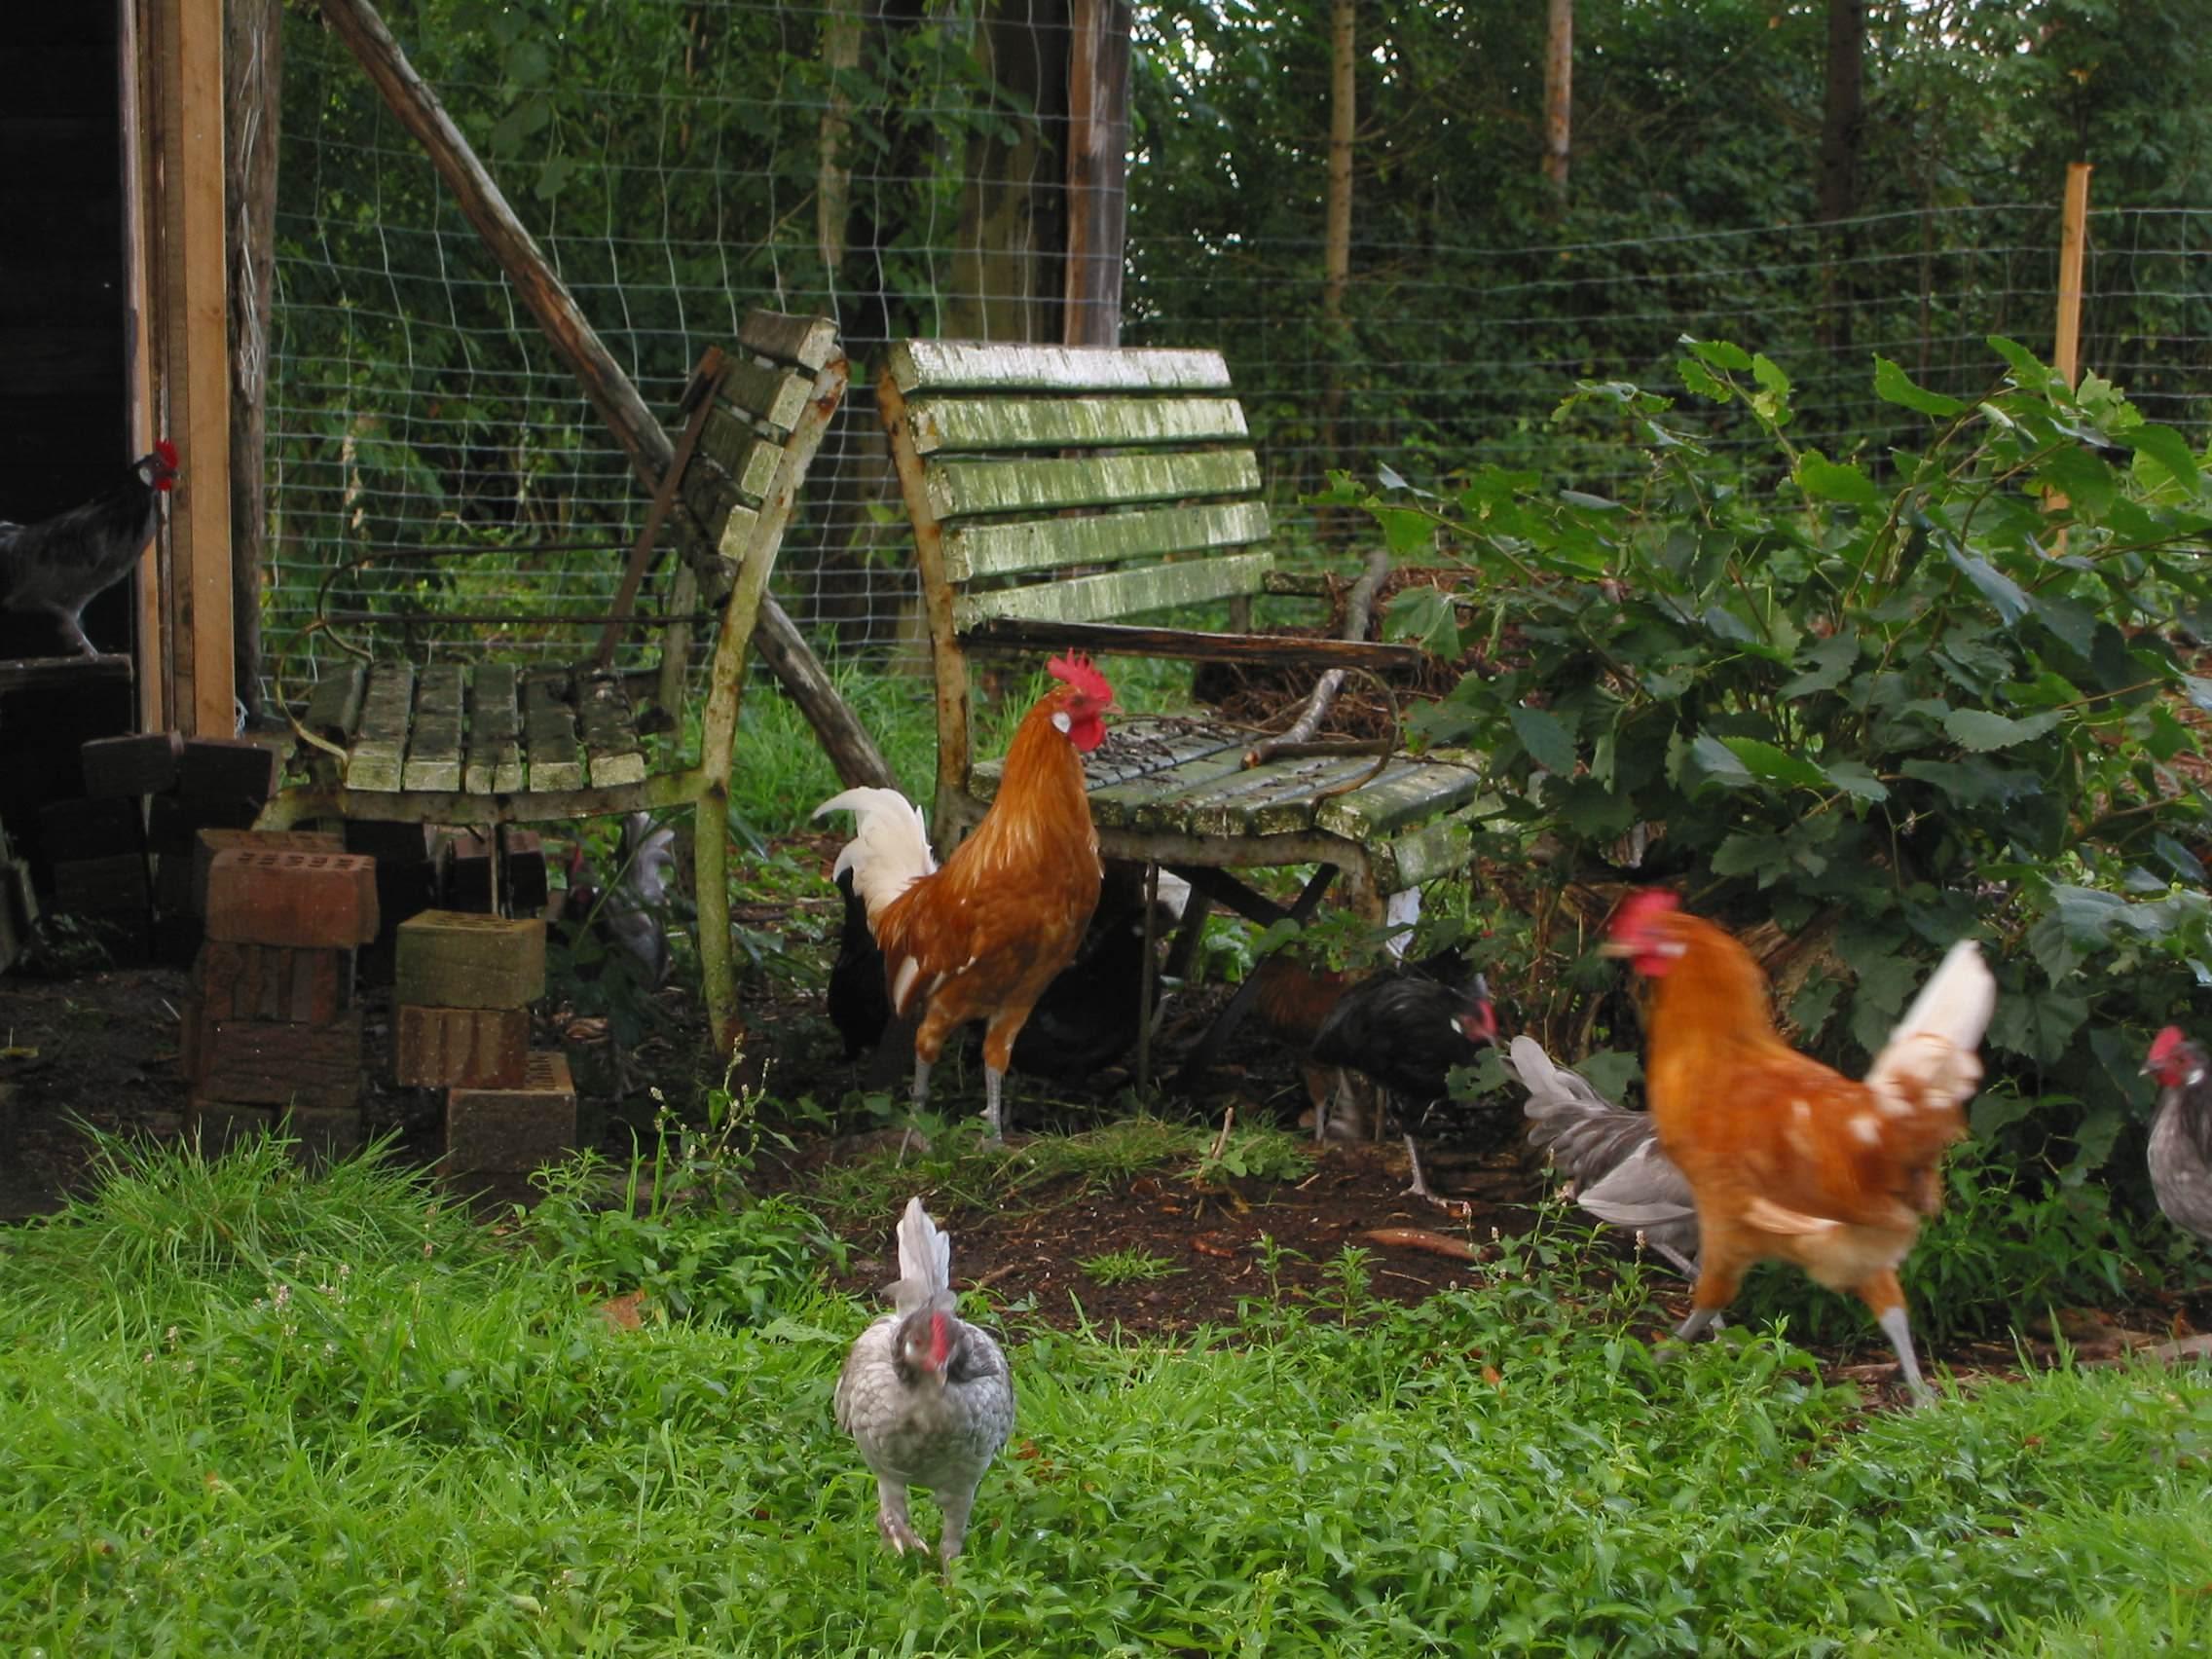 Hühner im Grünen